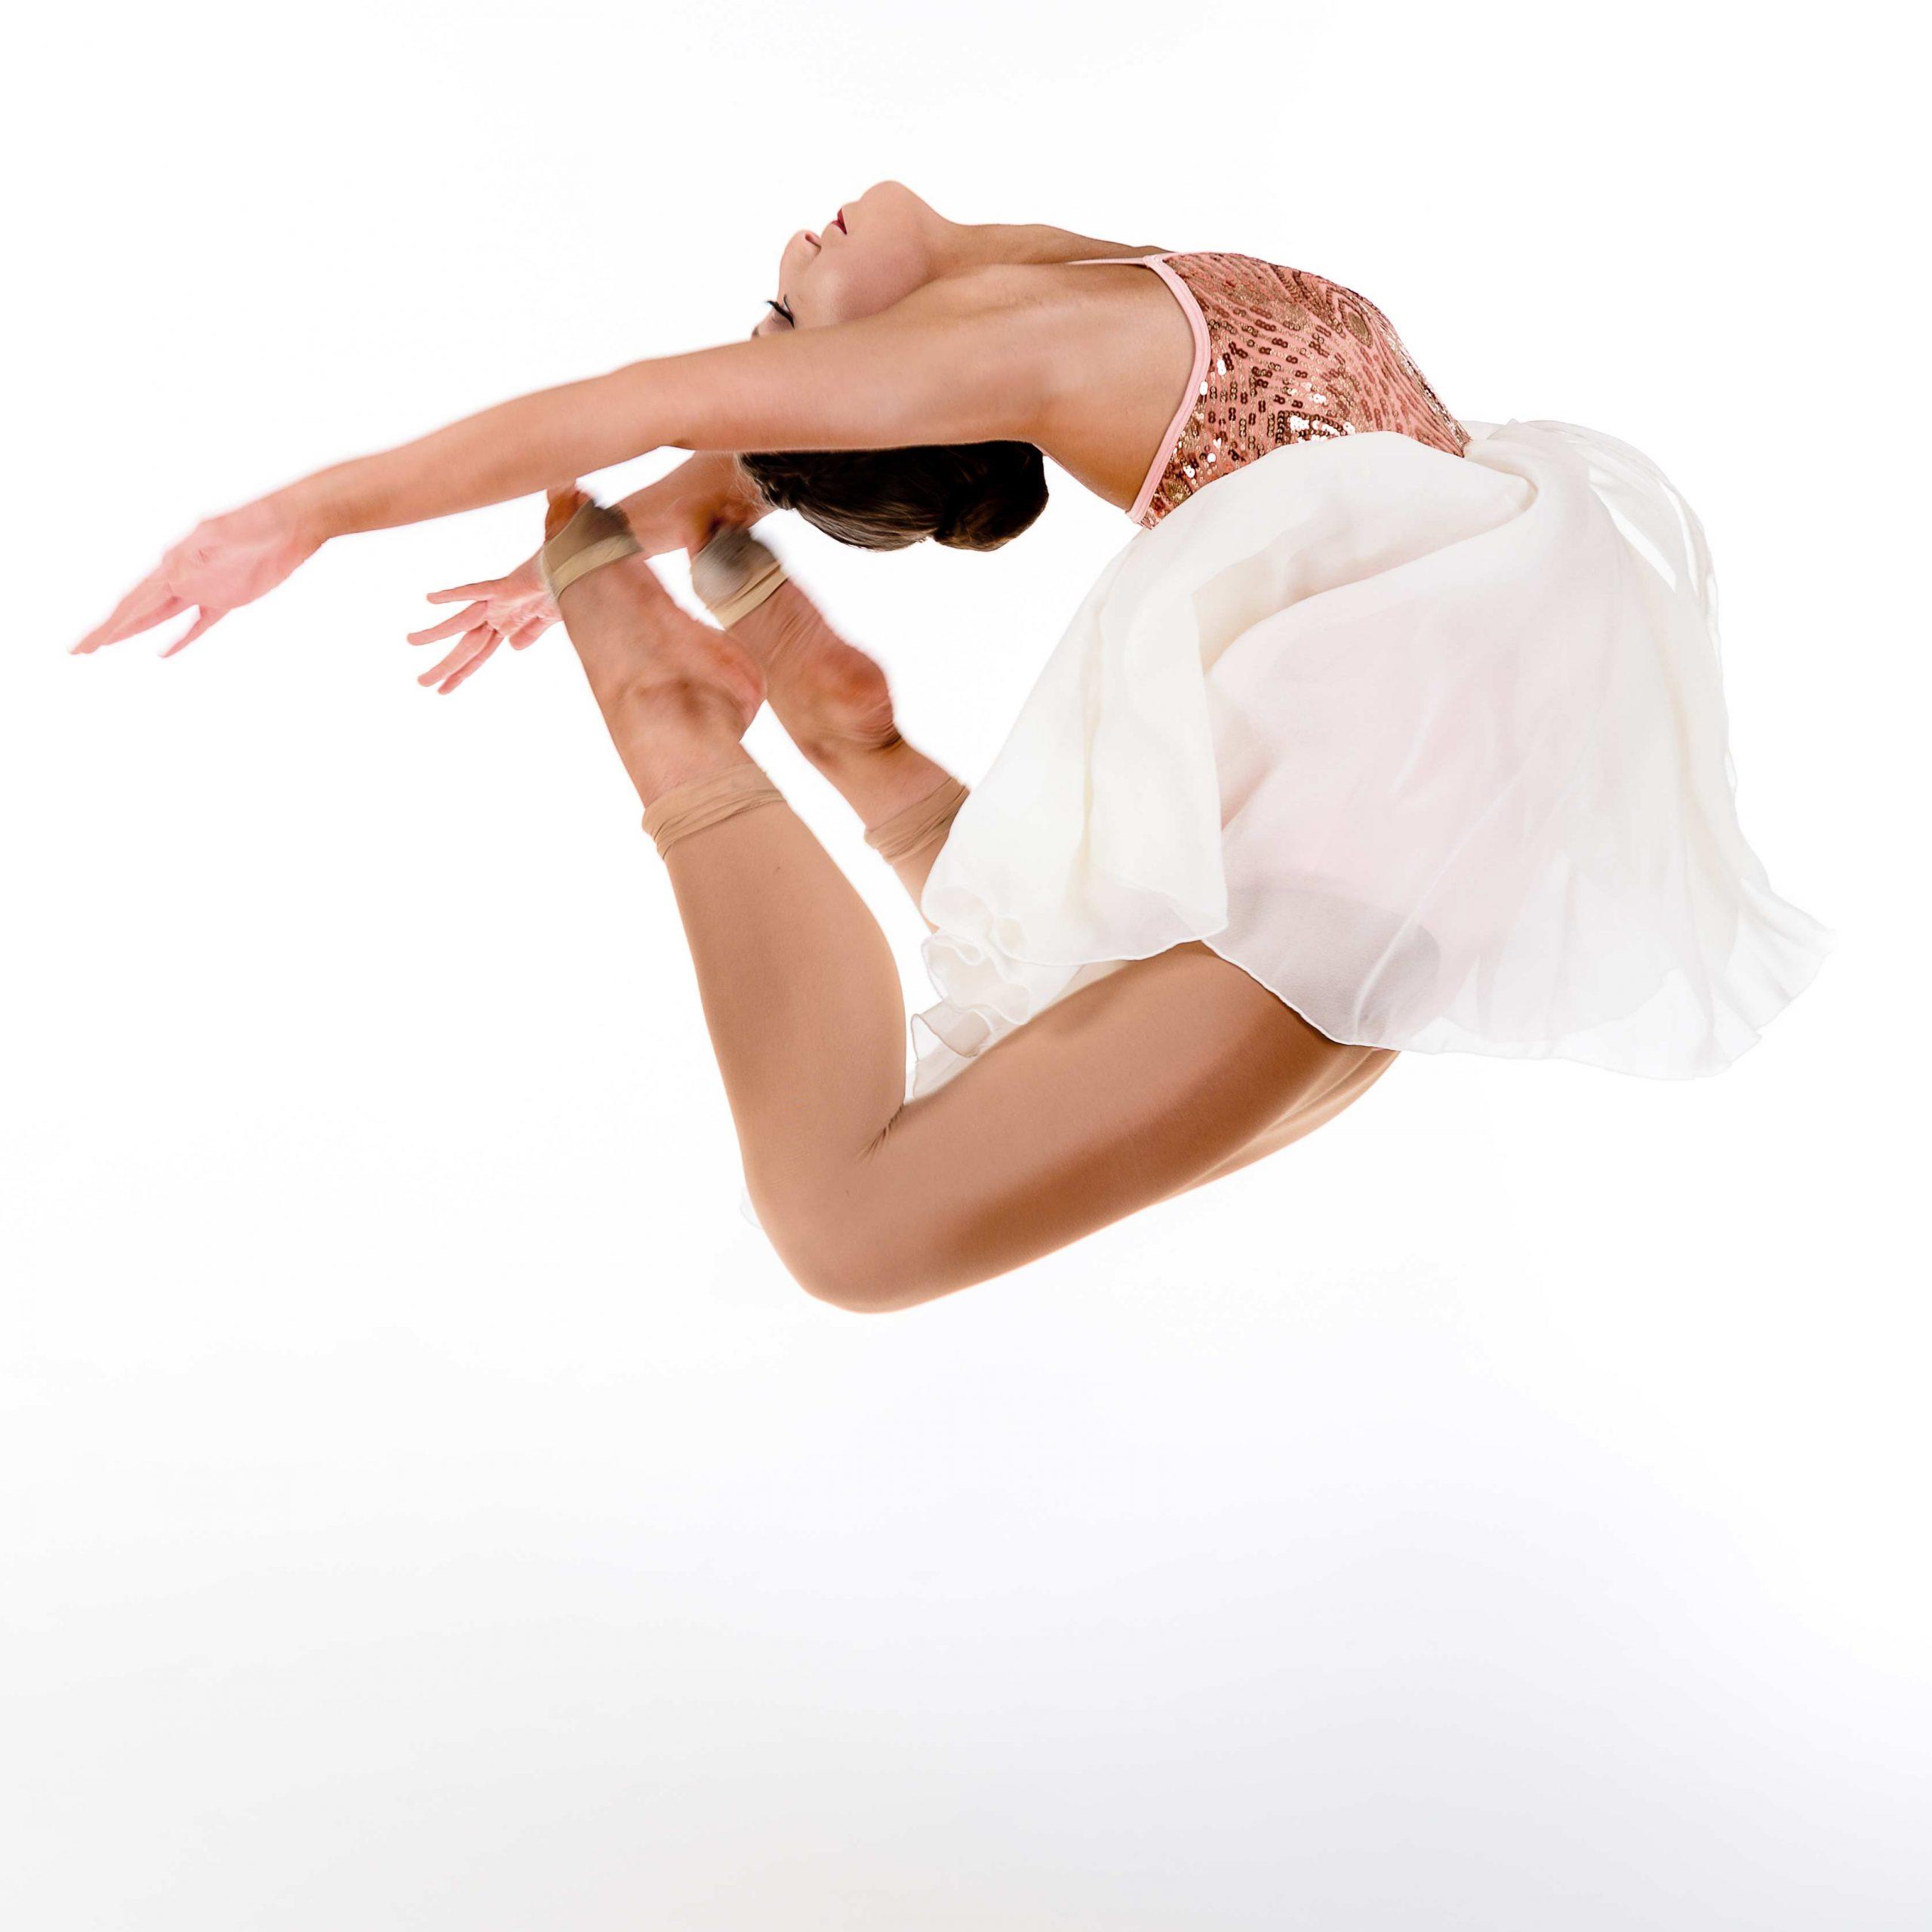 dancer in mid air